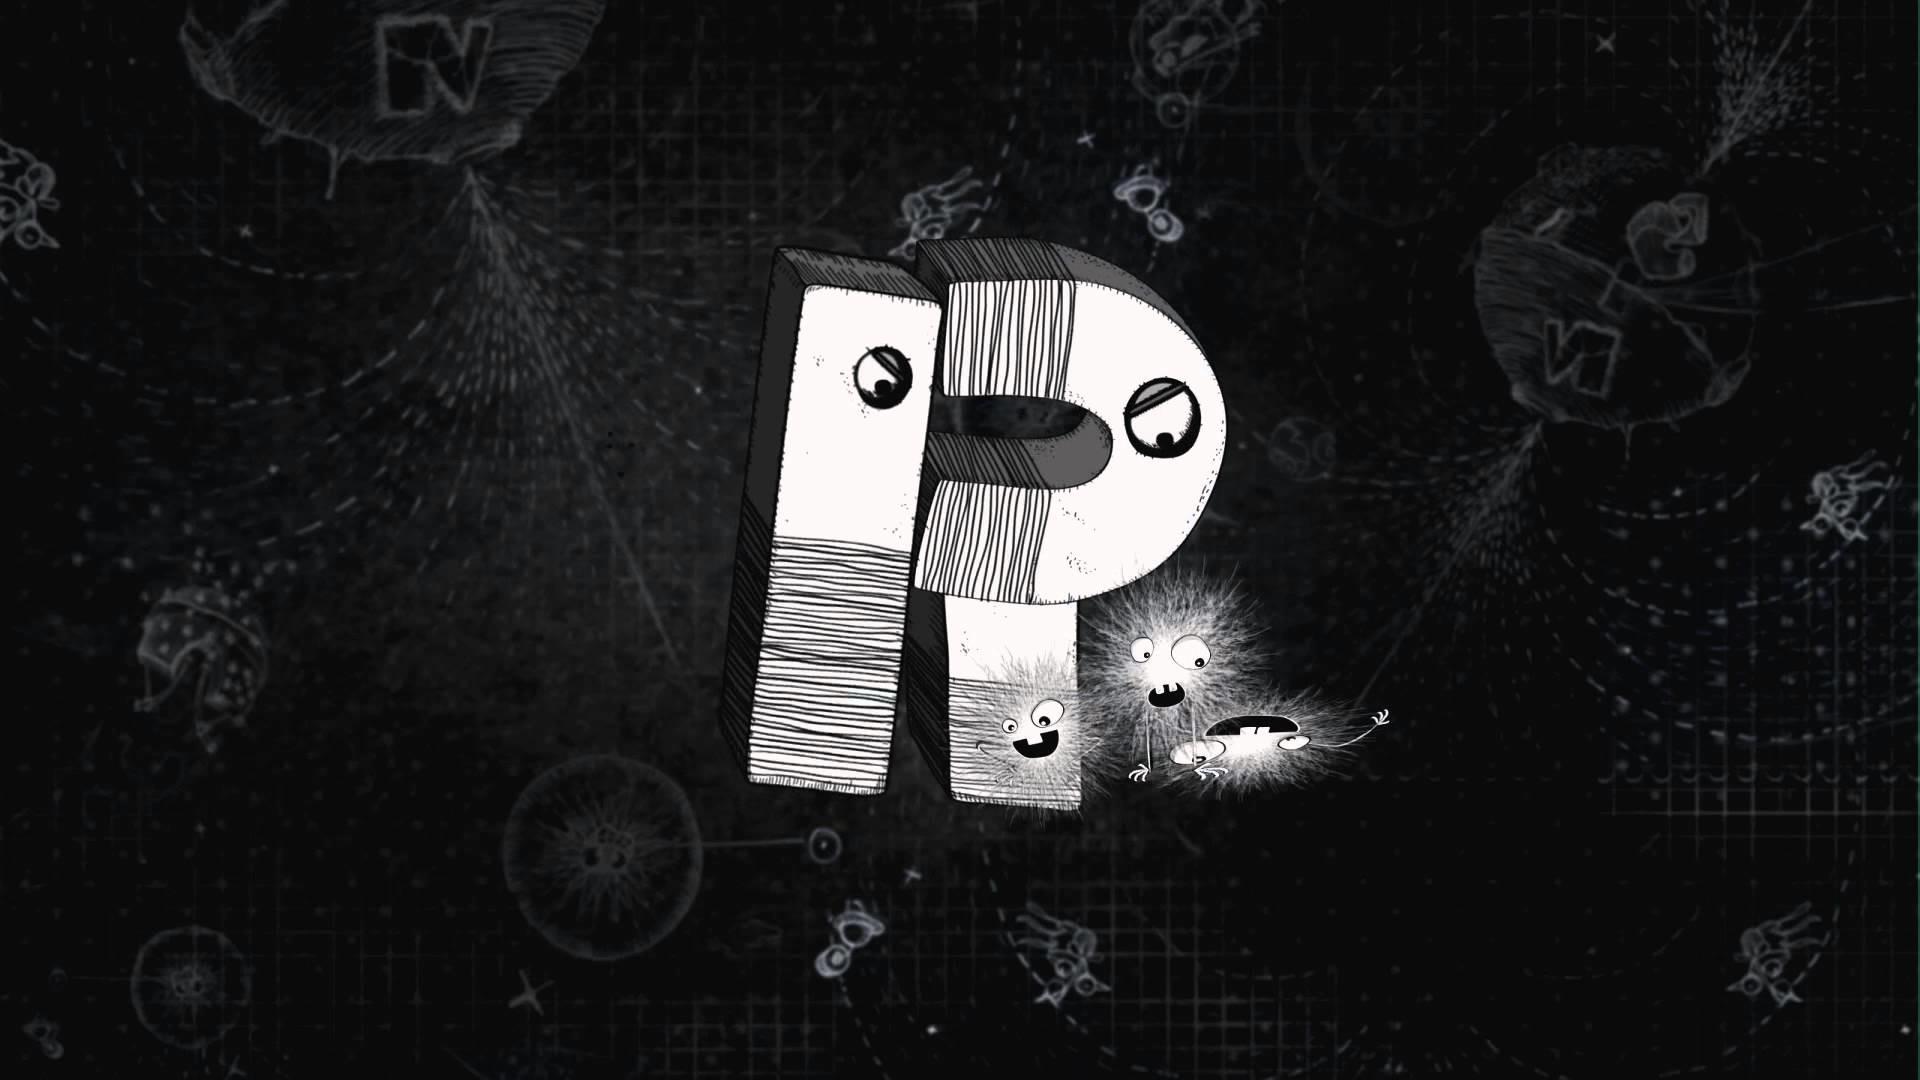 Hd Wallpaper Letter N: Letter R Wallpapers ·① WallpaperTag